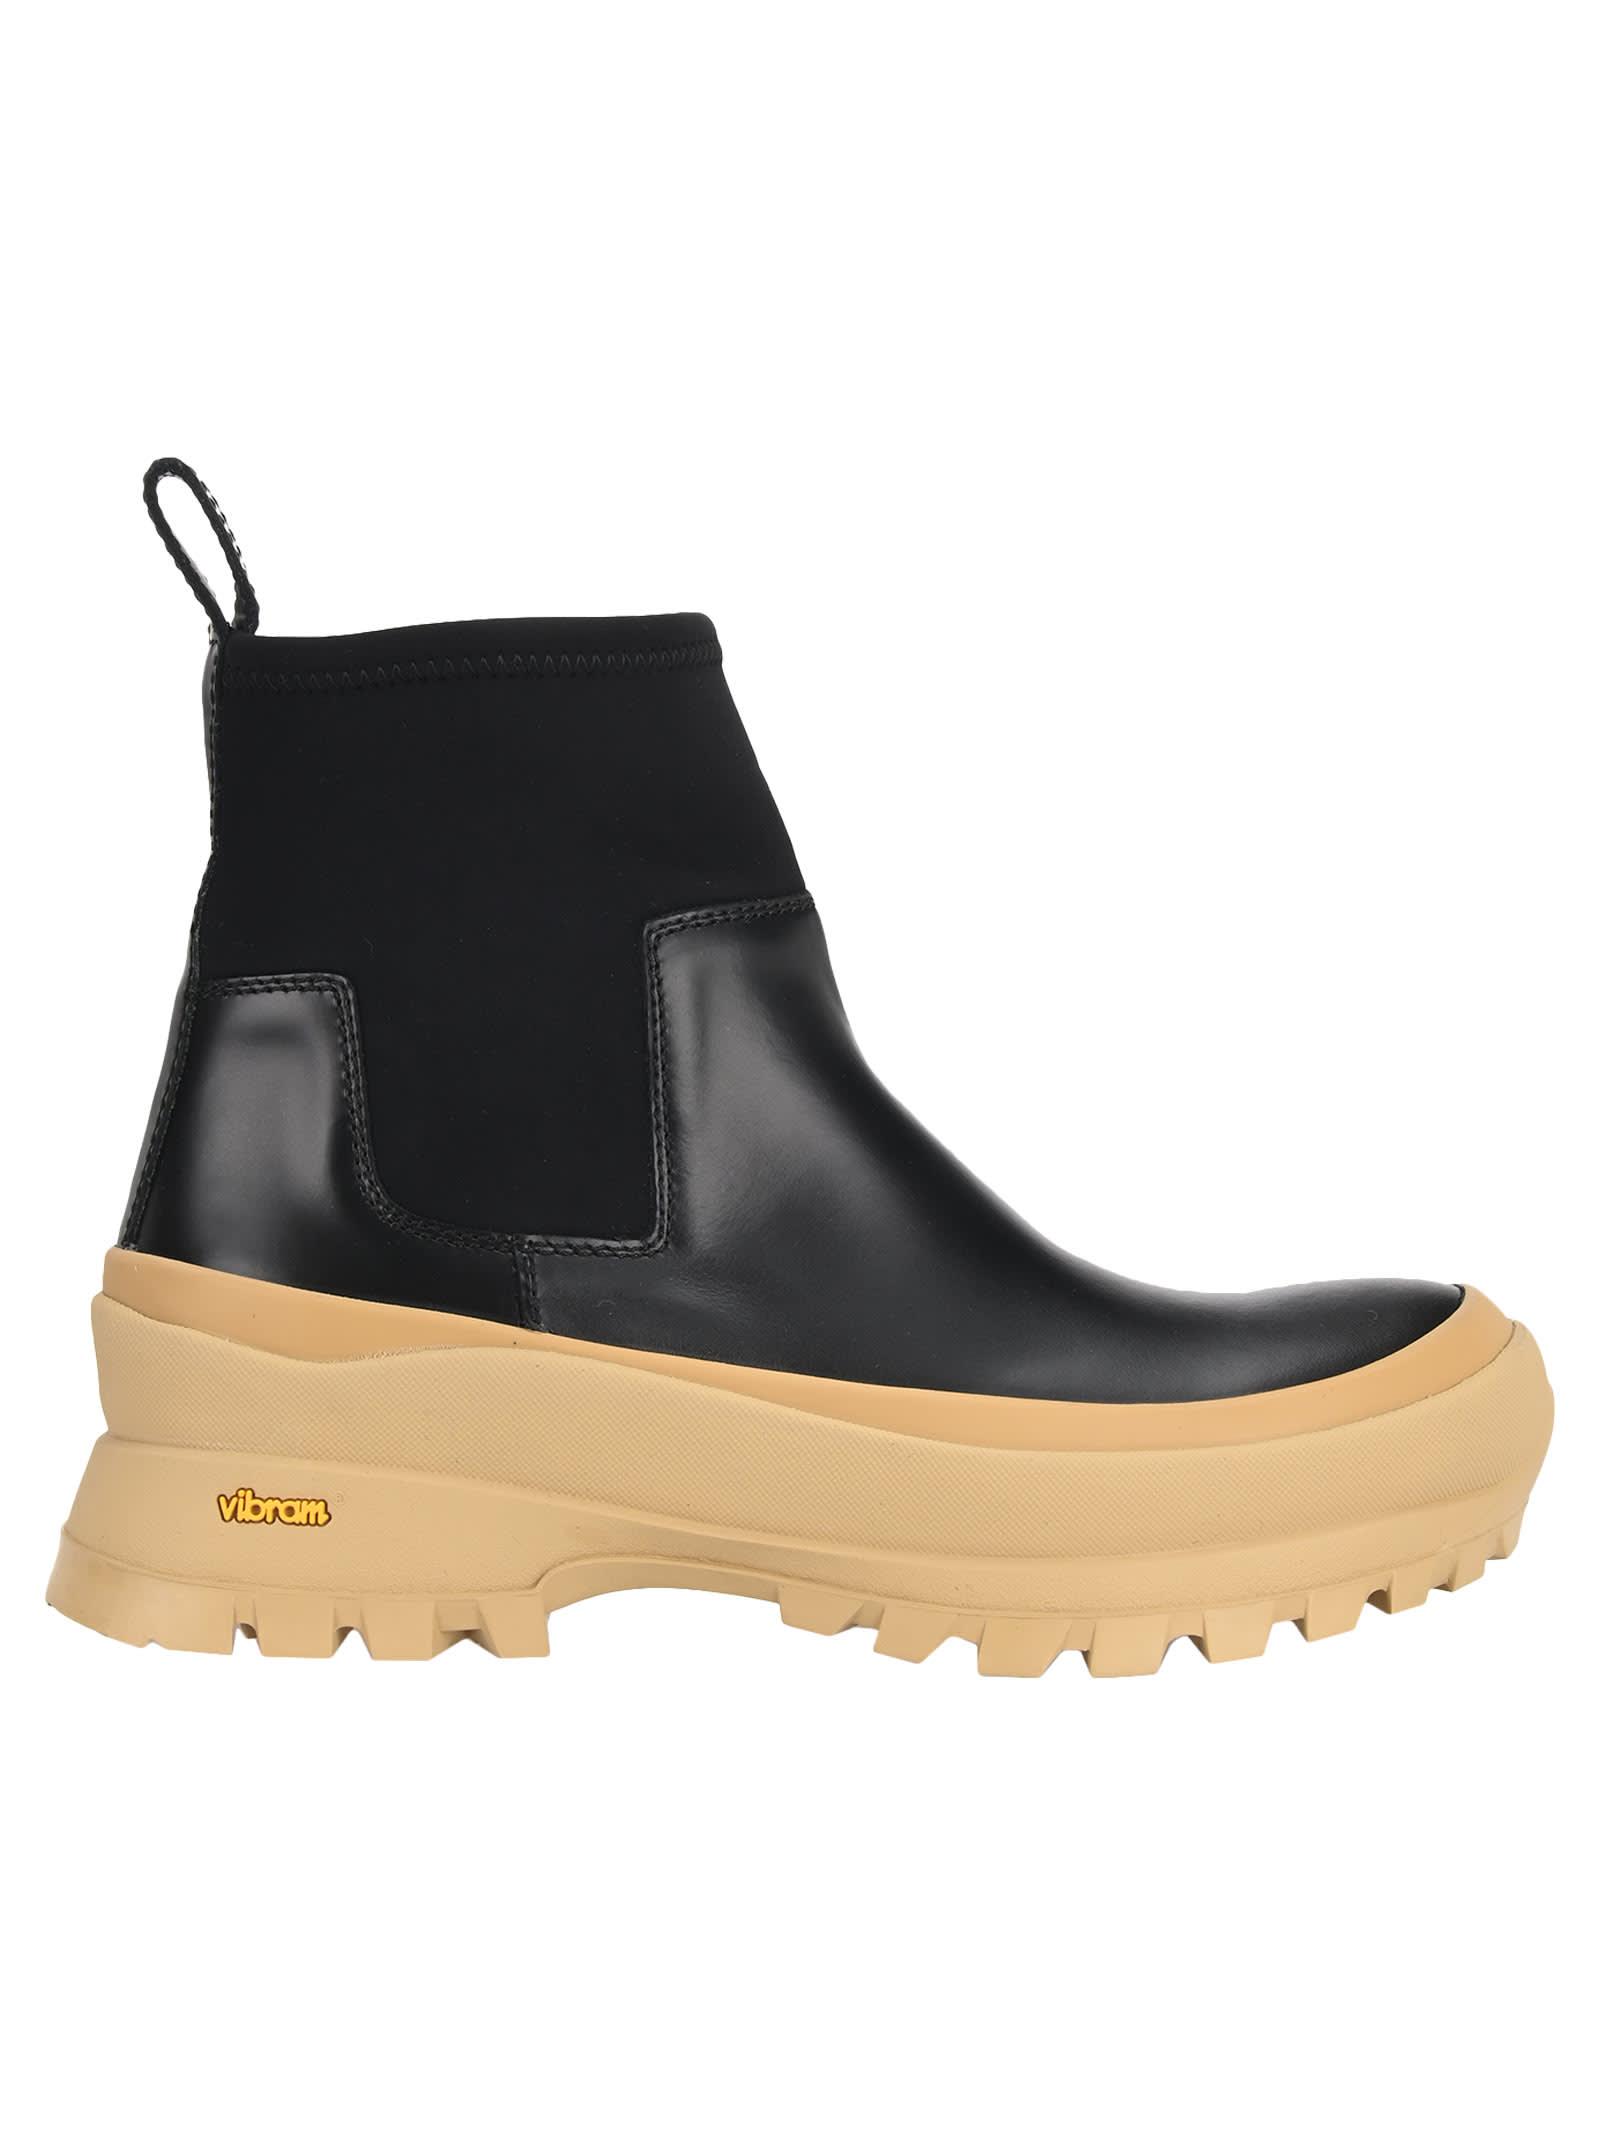 Jil Sander Vibram Sole Boots